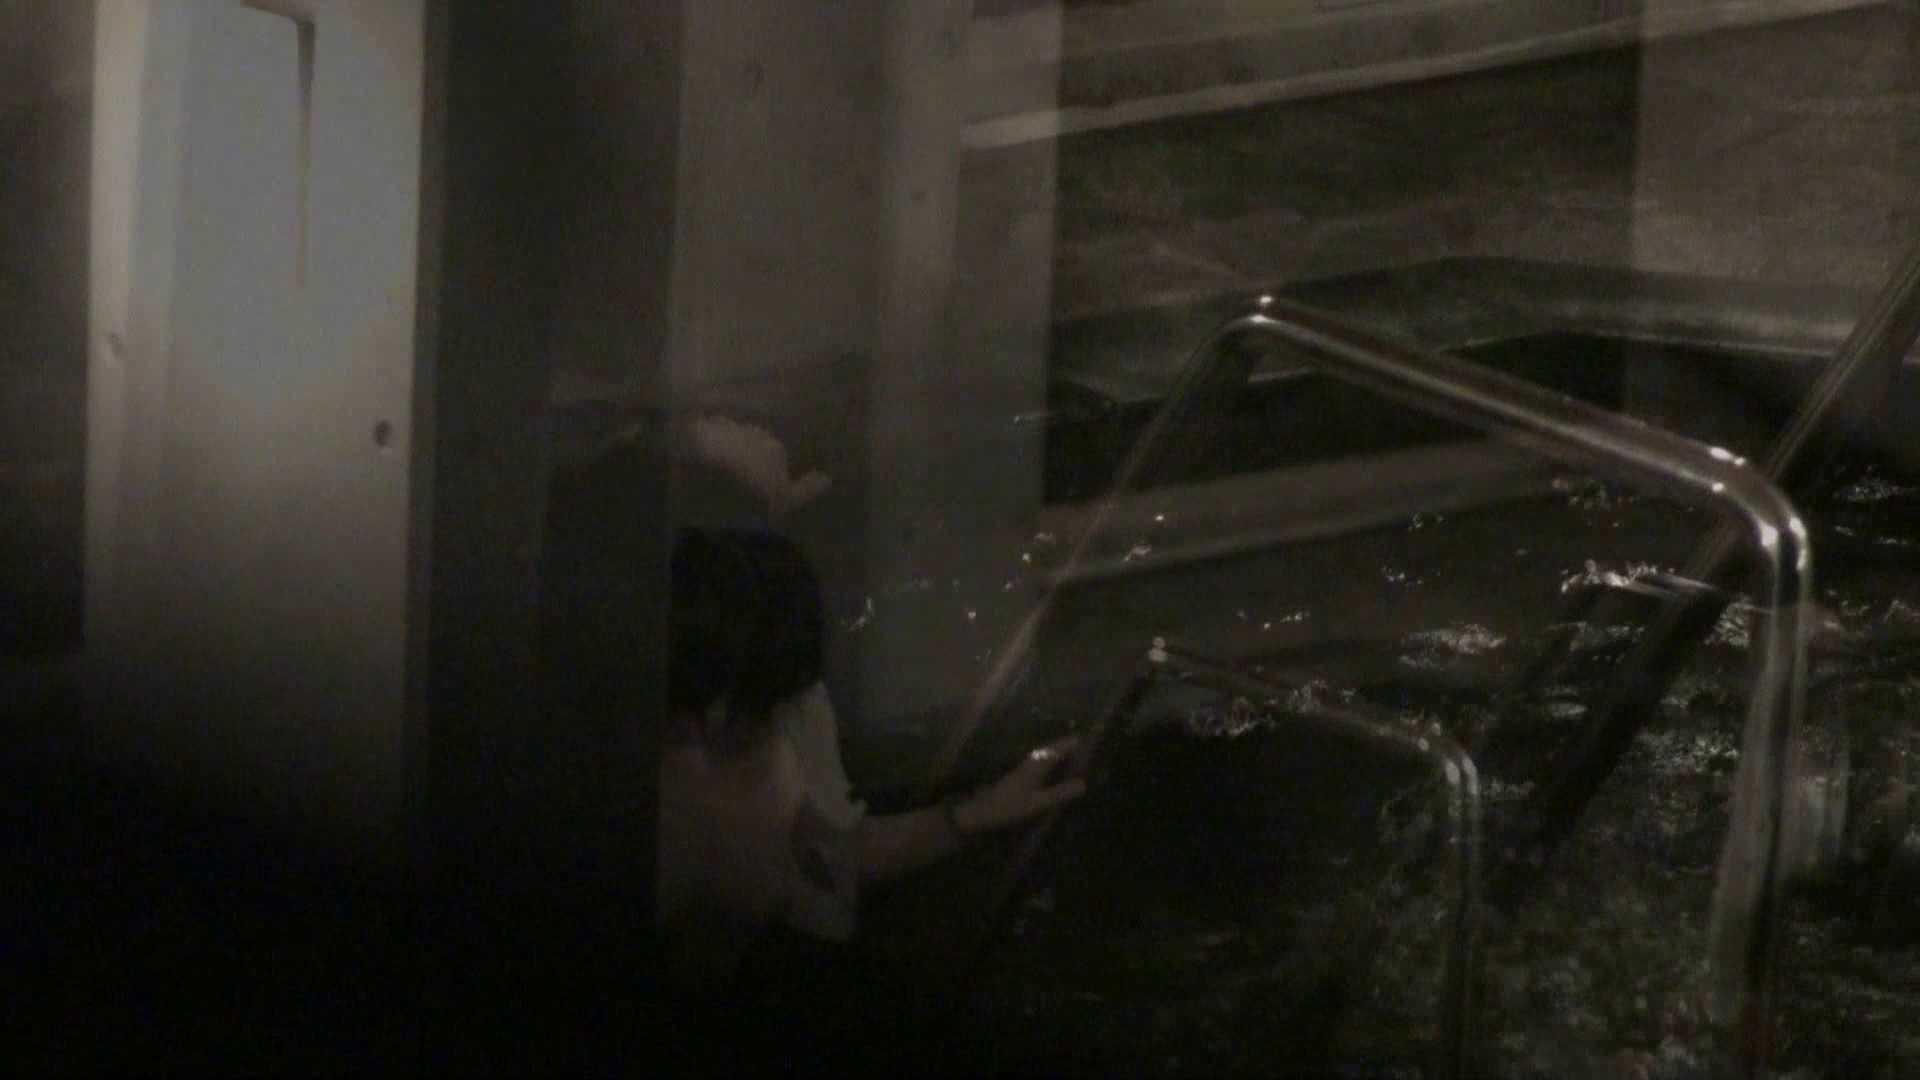 Aquaな露天風呂Vol.357 盗撮 のぞき動画画像 99連発 68